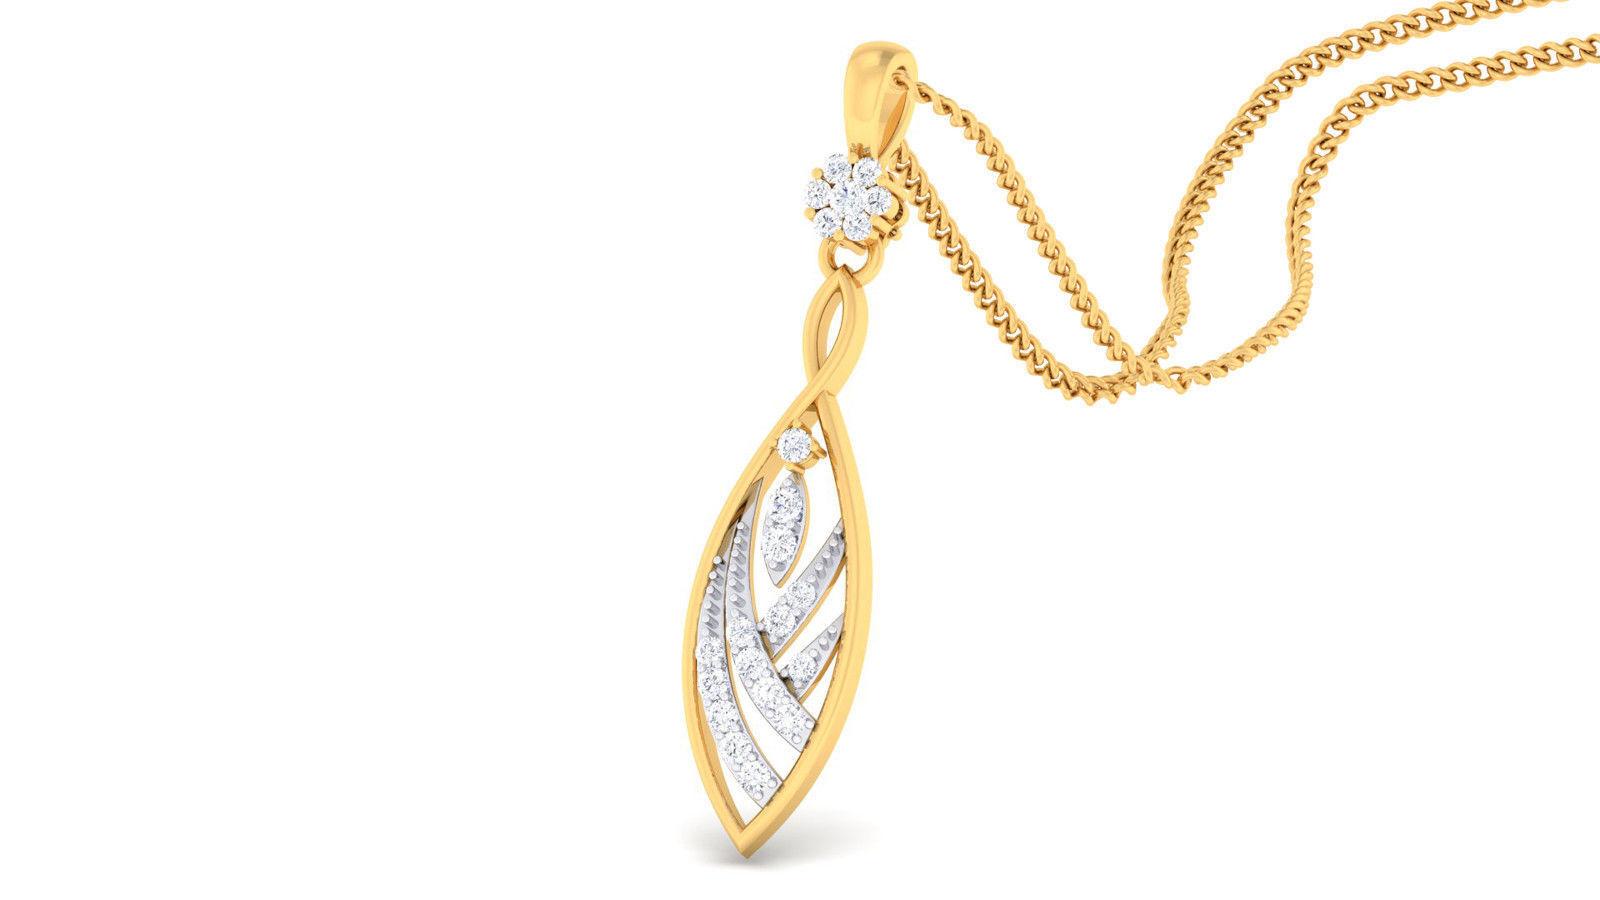 0.29 Cts Round Brilliant Cut Natural Diamonds Pendant In Solid Hallmark 14K gold